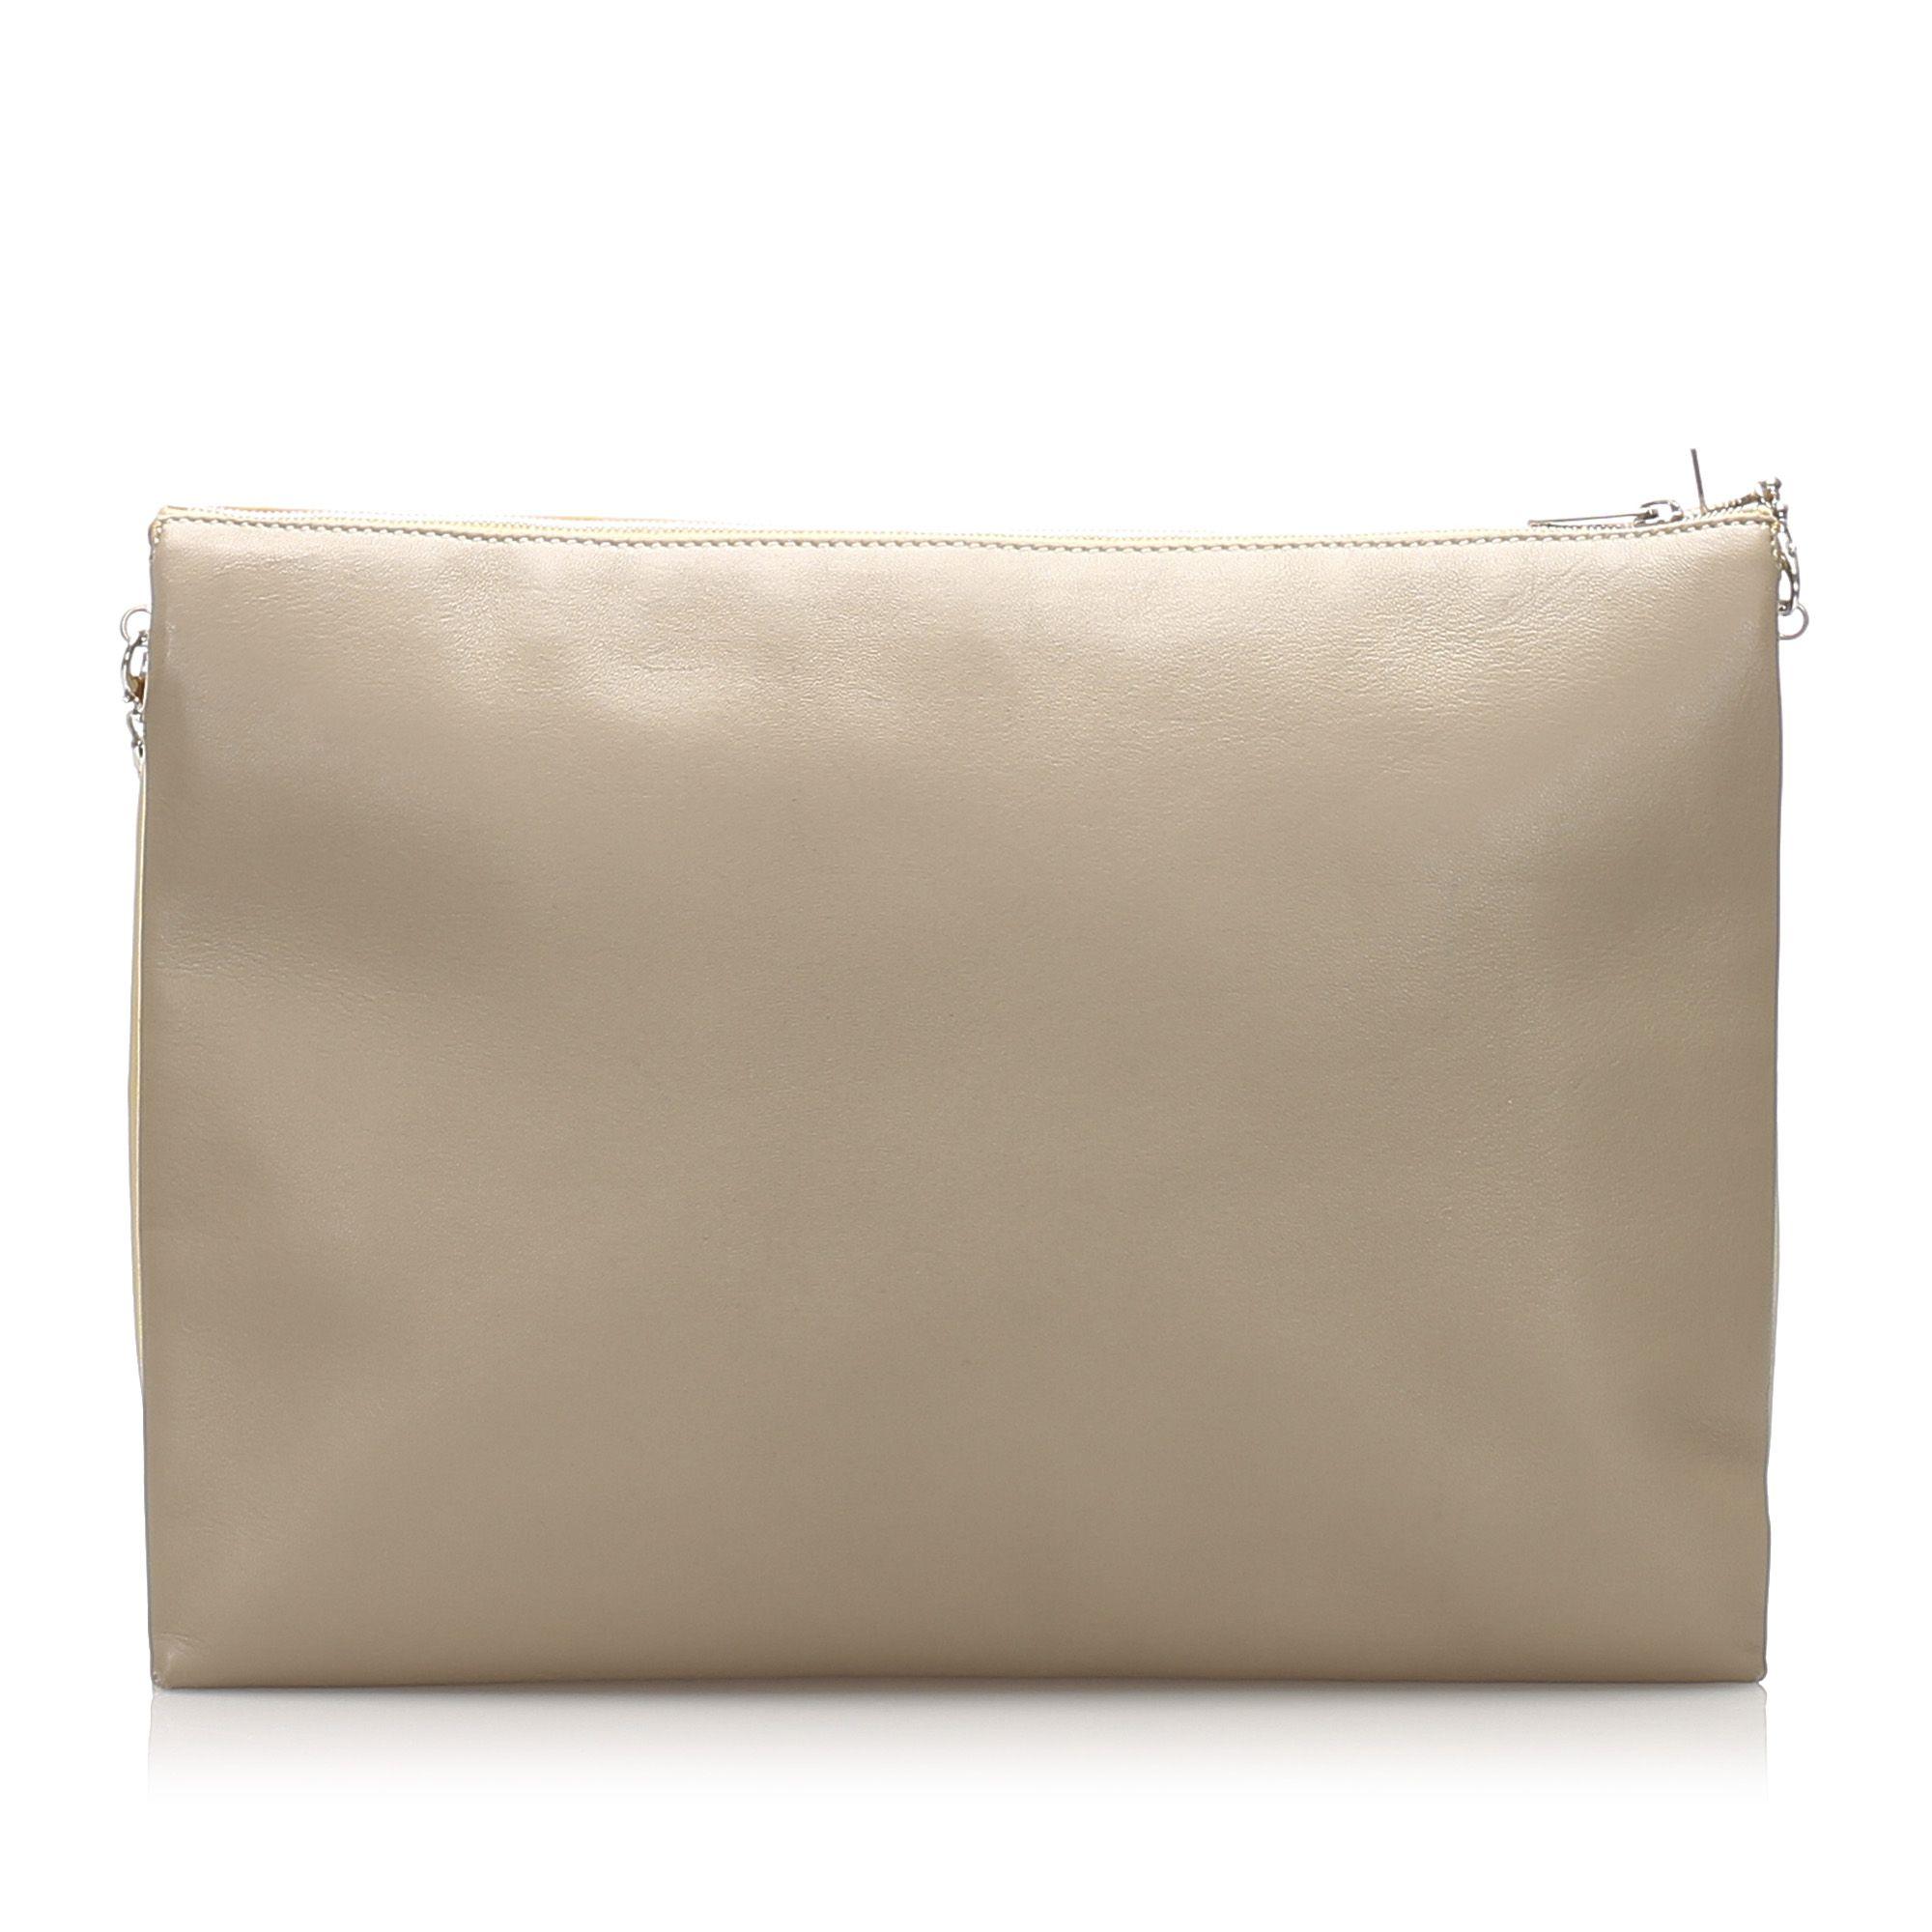 Vintage Celine Trio Chain Leather Shoulder Bag Yellow